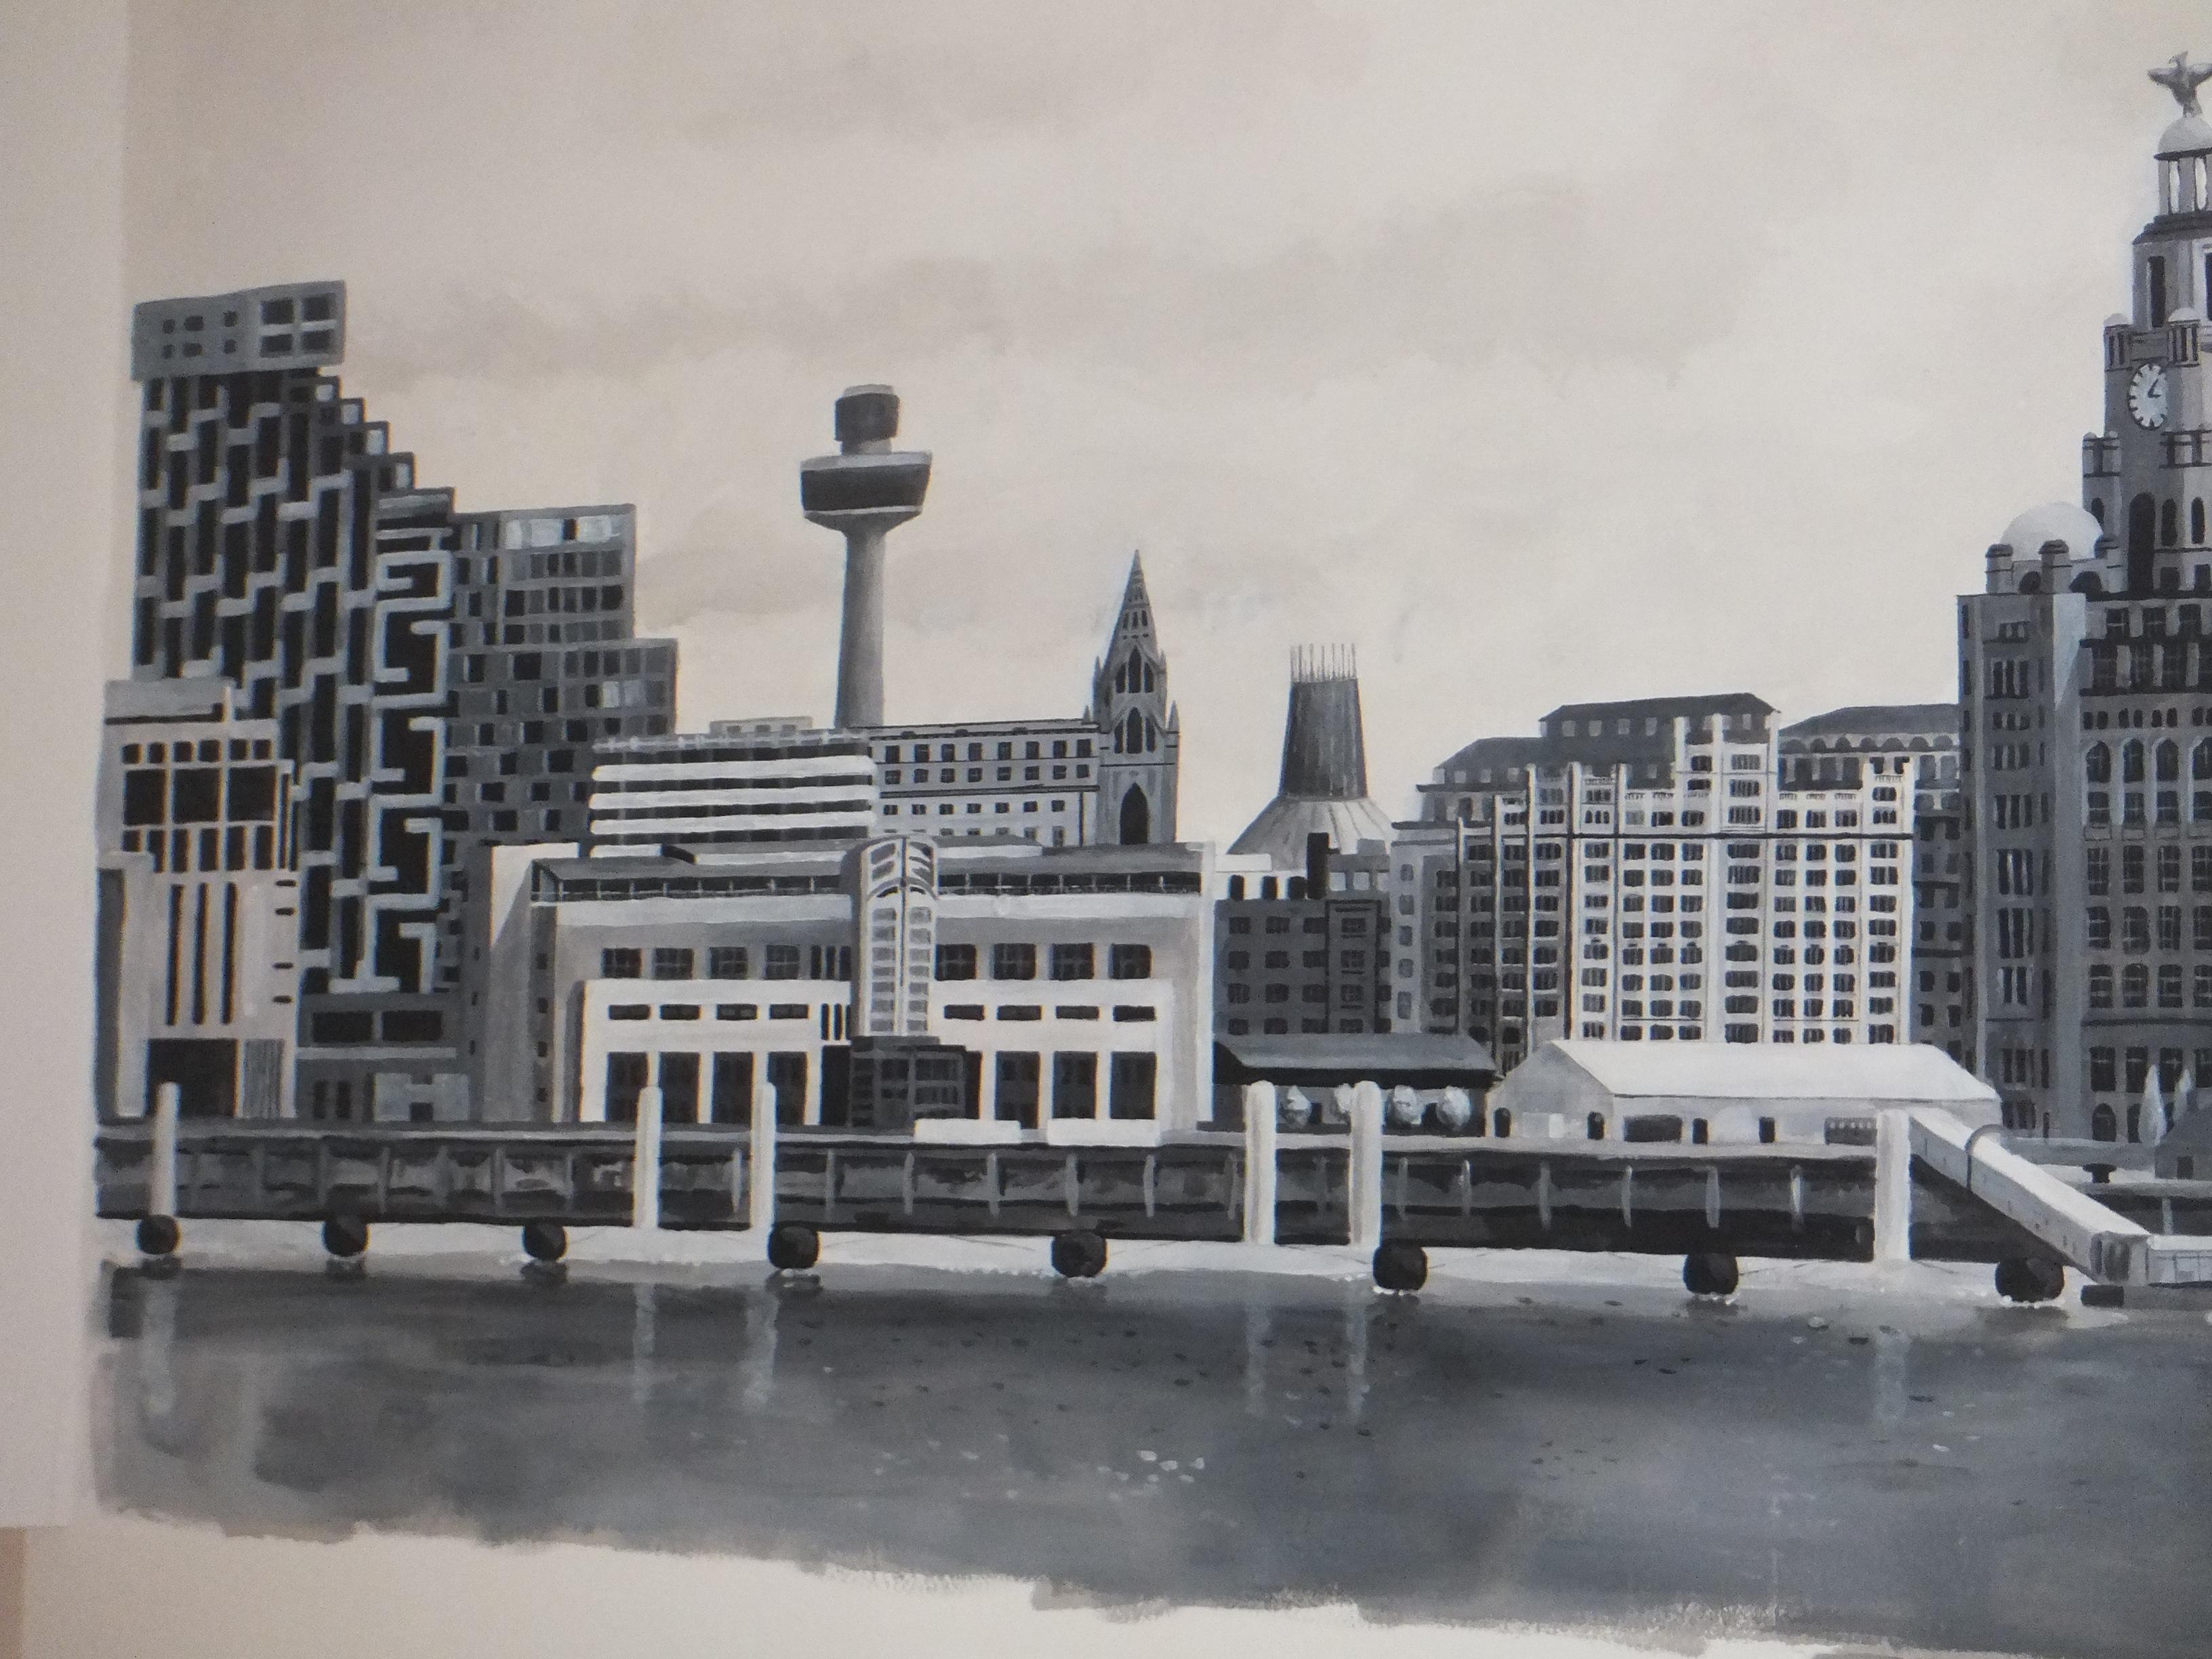 Pier head terminus Liverpool waterfront view mural